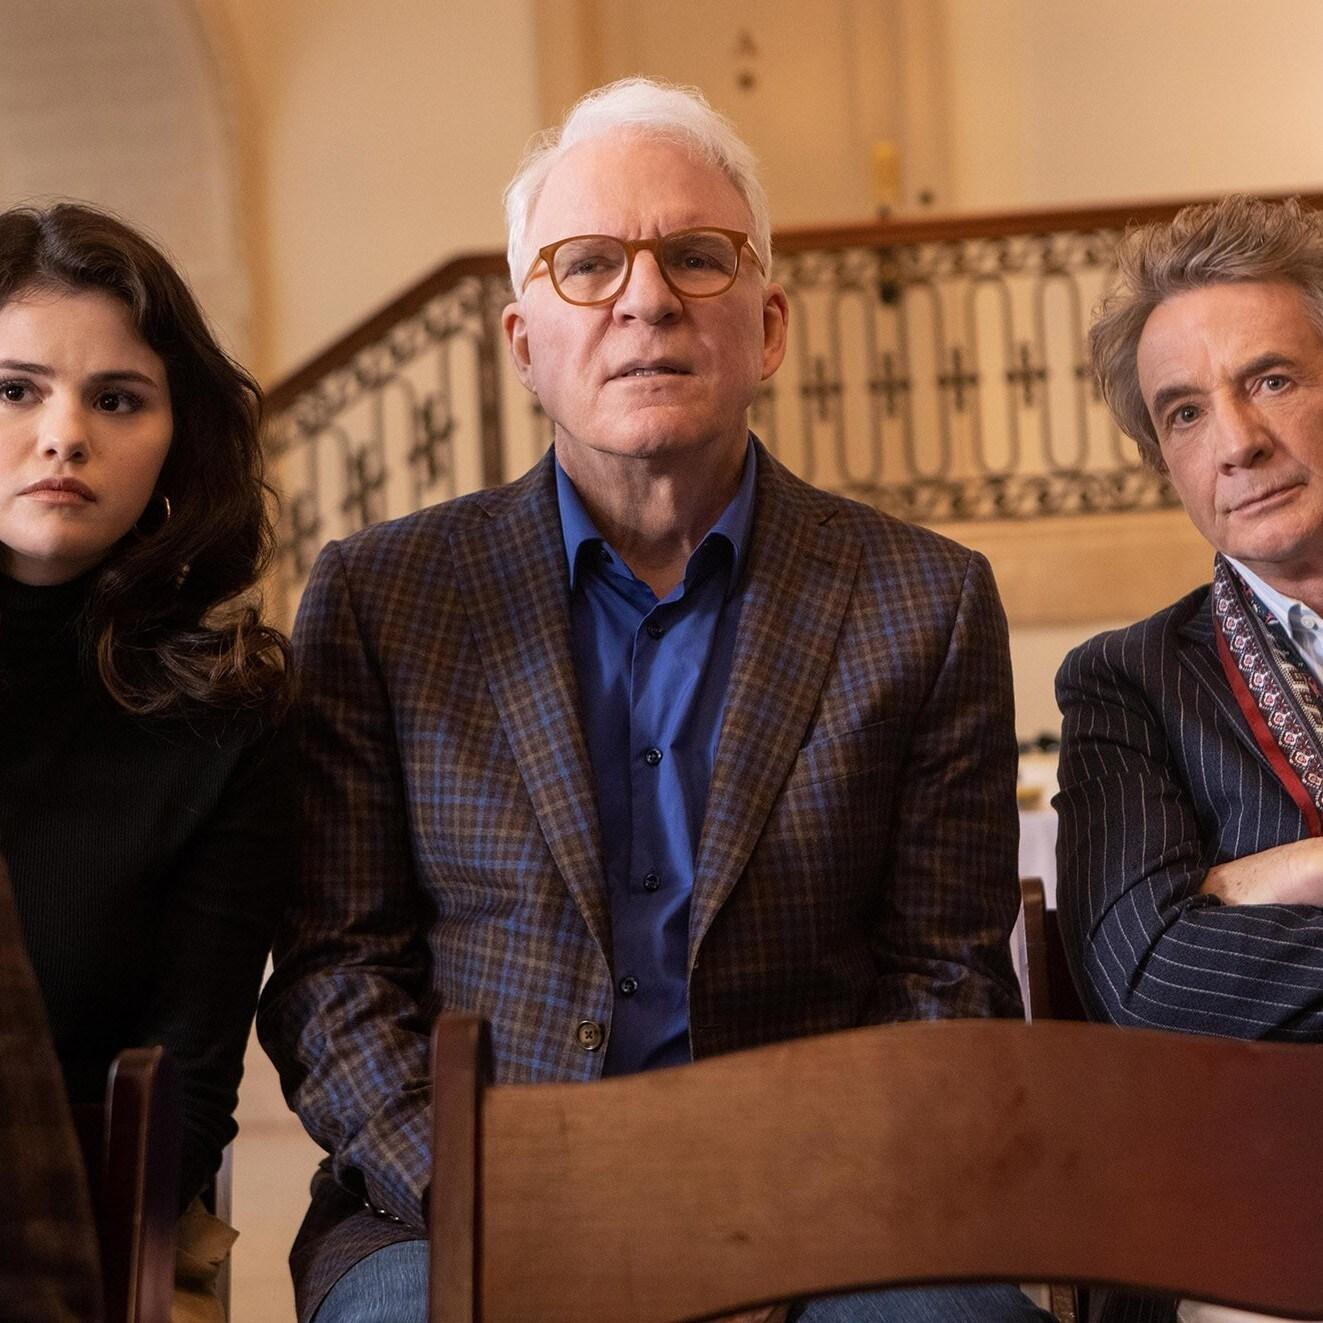 Star+ confirma a segunda temporada de Only Murders in the Building